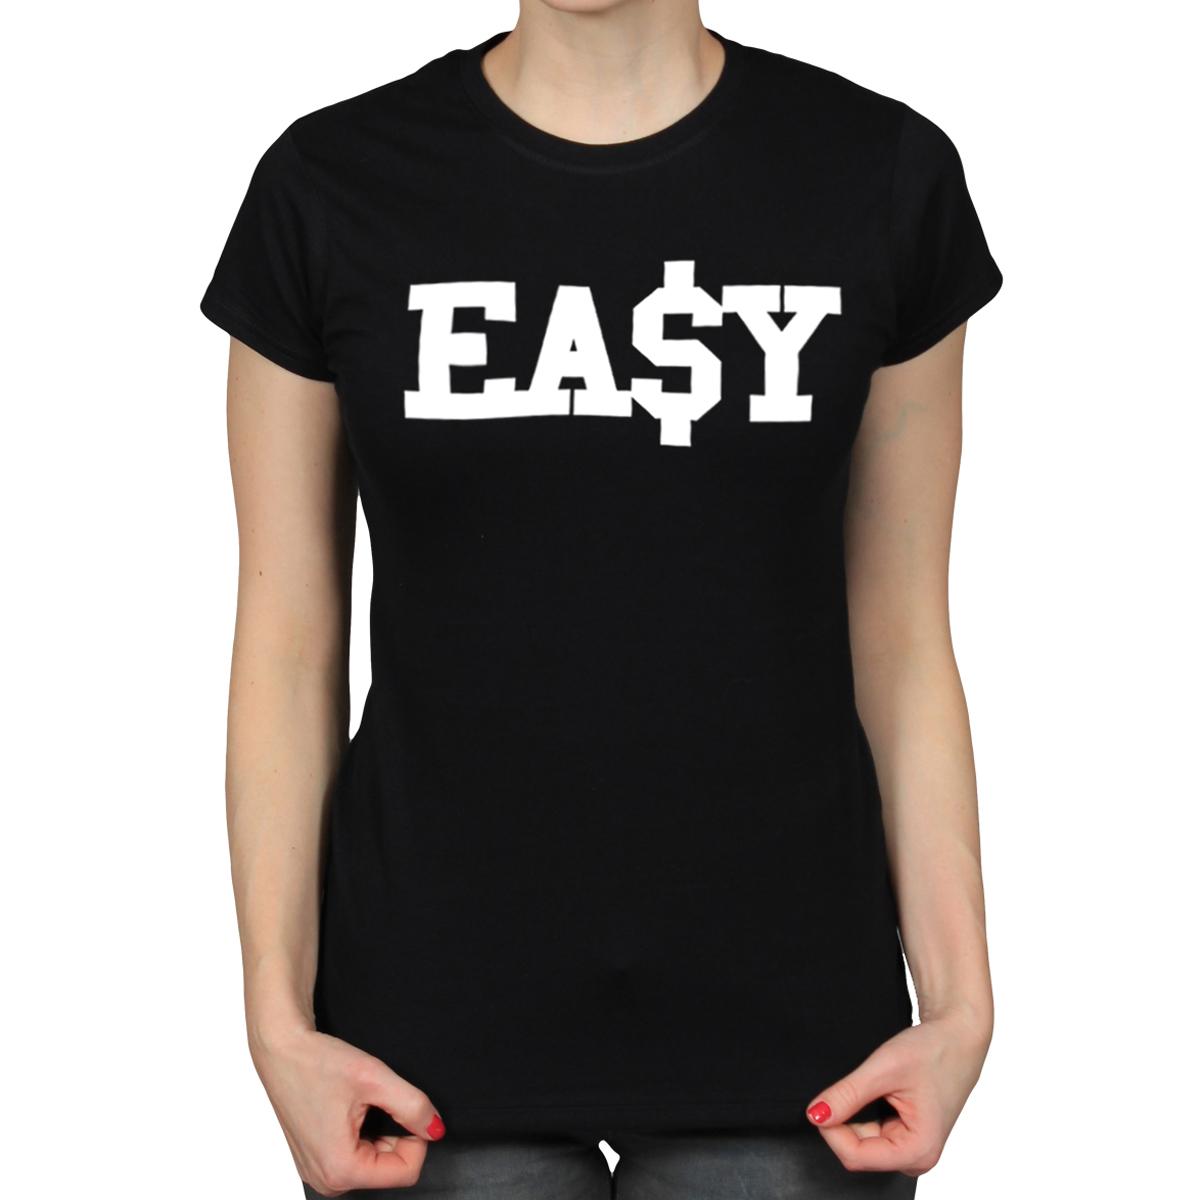 EASY DOLLAR COLLEGE SWAG URBAN RAP HIP HOP LADIES BLACK T-SHIRT GIRLS TEE [331] | eBay